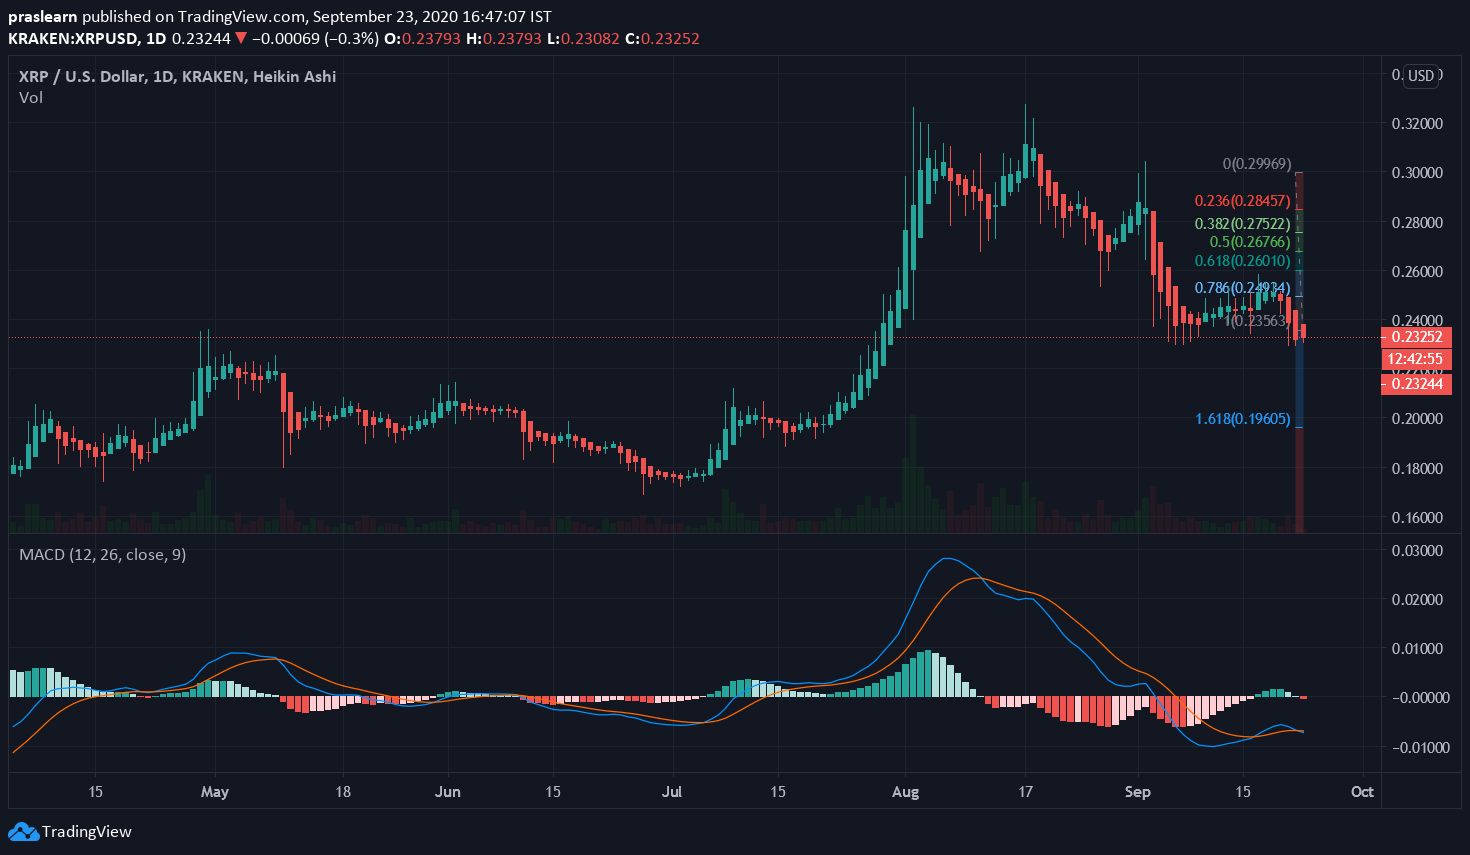 XRP/USD Daily – Tradingview